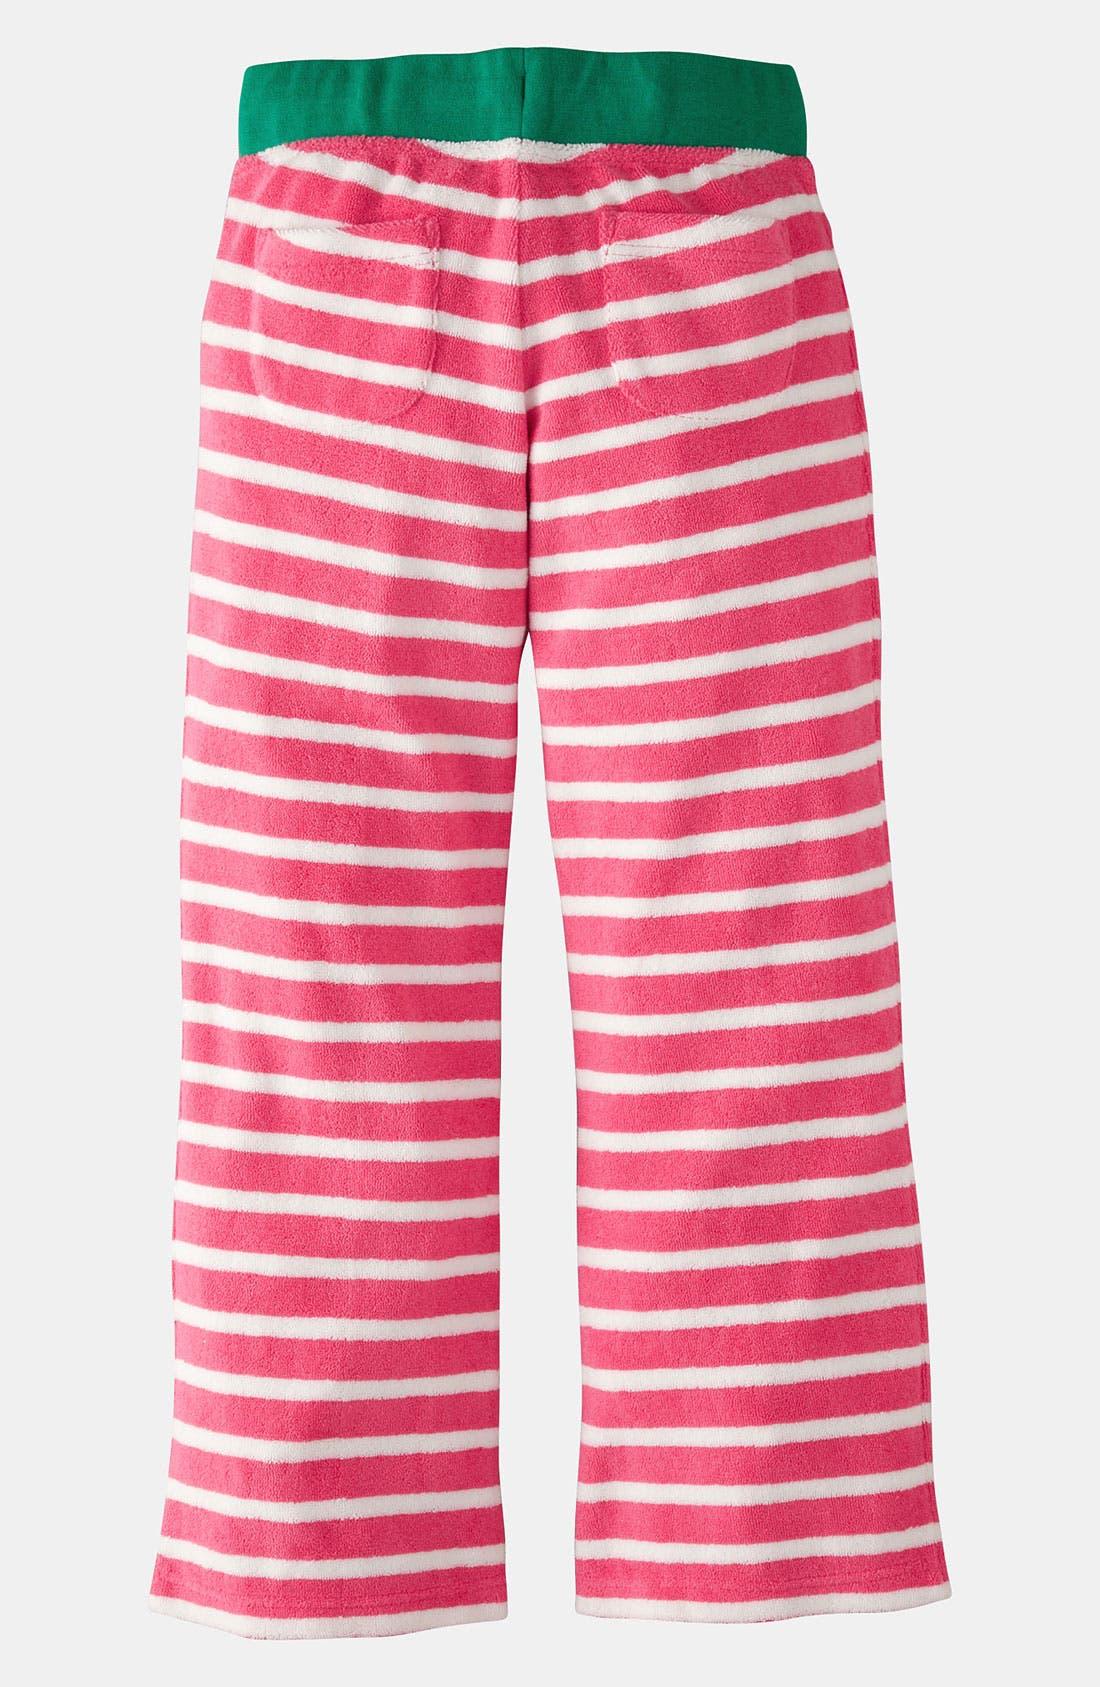 Alternate Image 2  - Mini Boden 'Toweling' Pants (Little Girls & Big Girls)